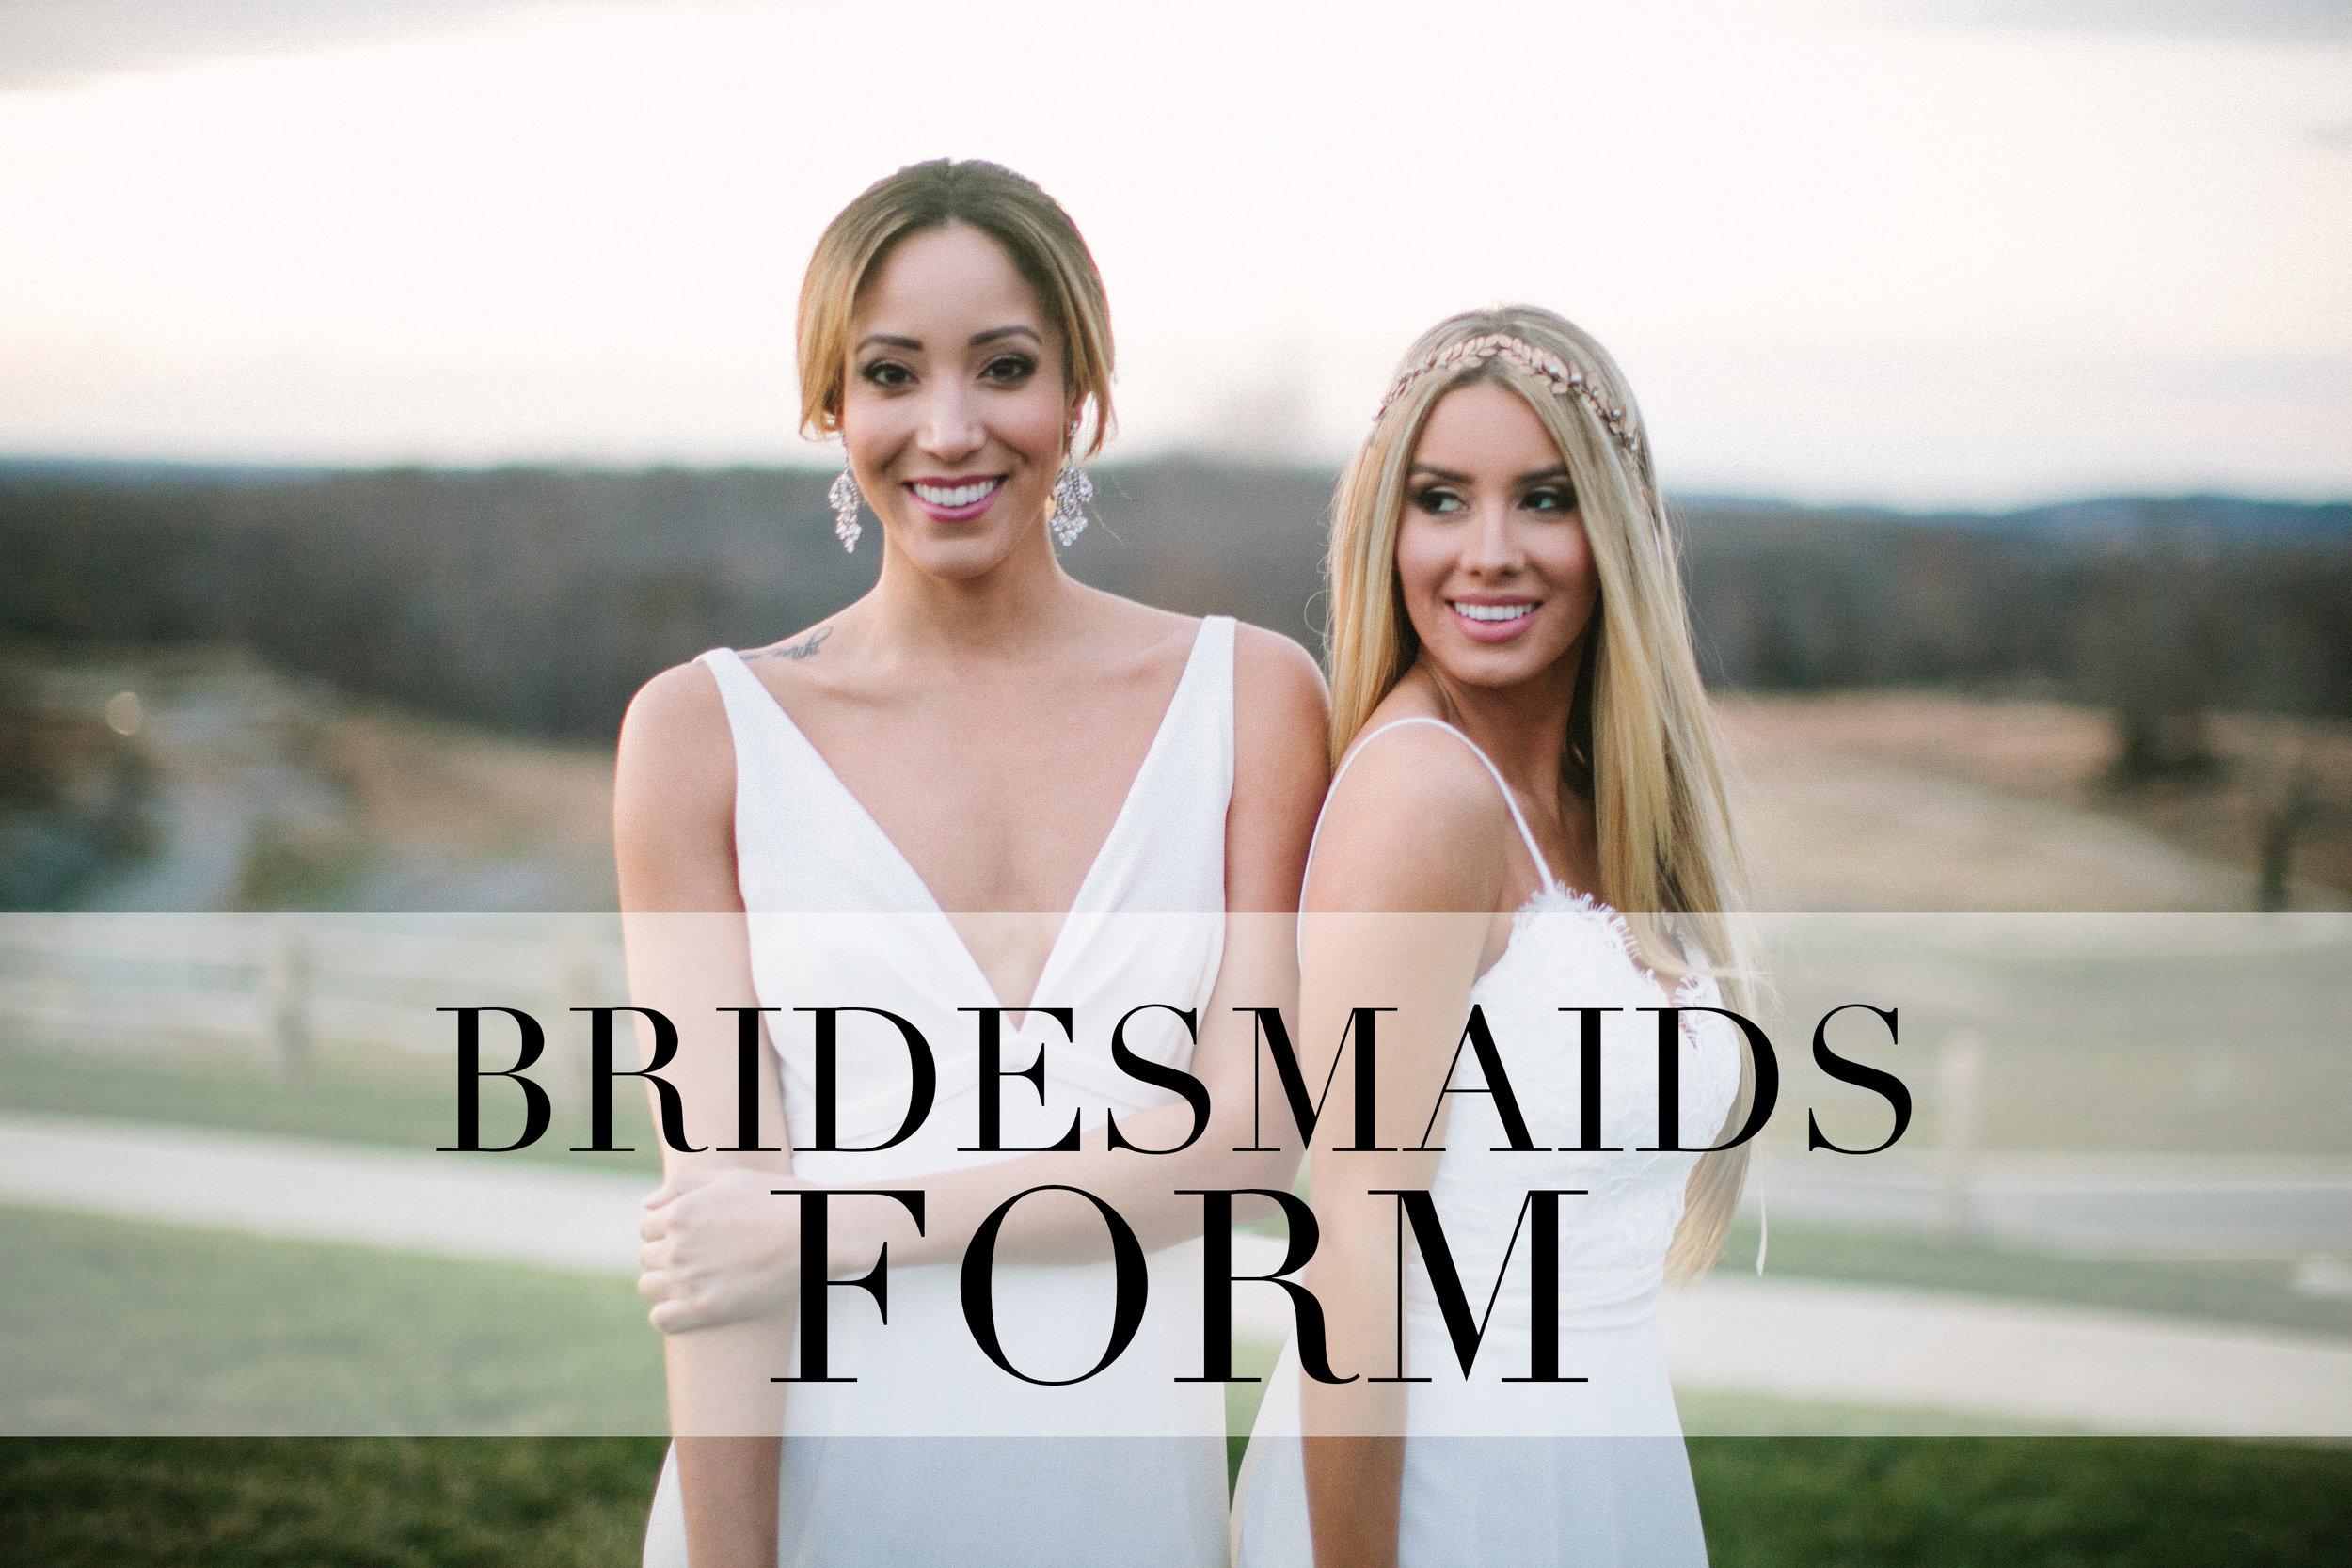 BRIDESMAIDS FORM